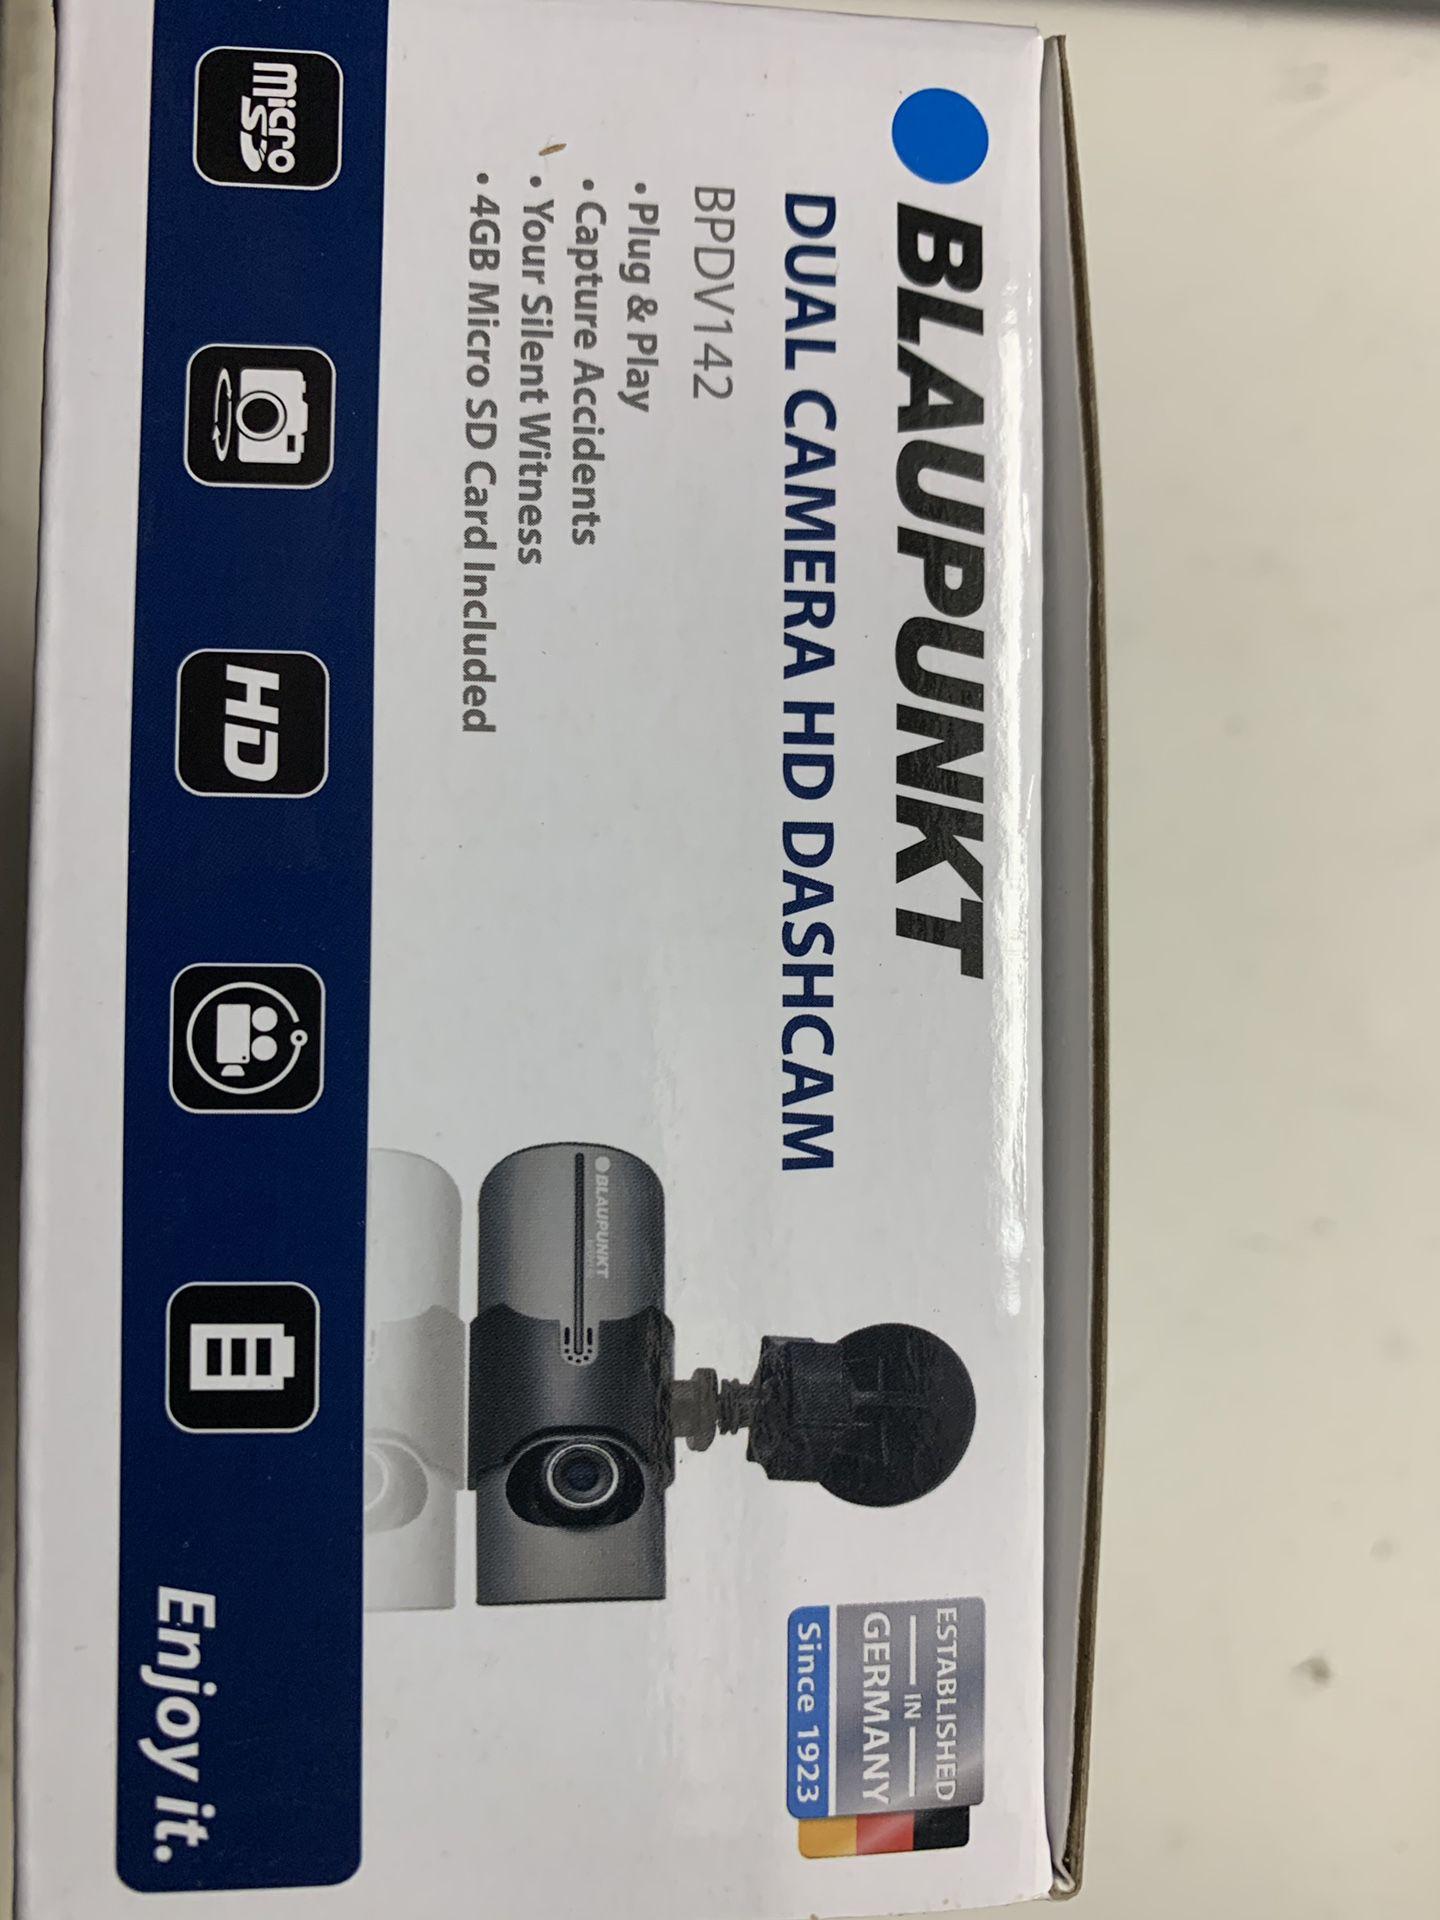 Blaunkpunkt dual dash cameras